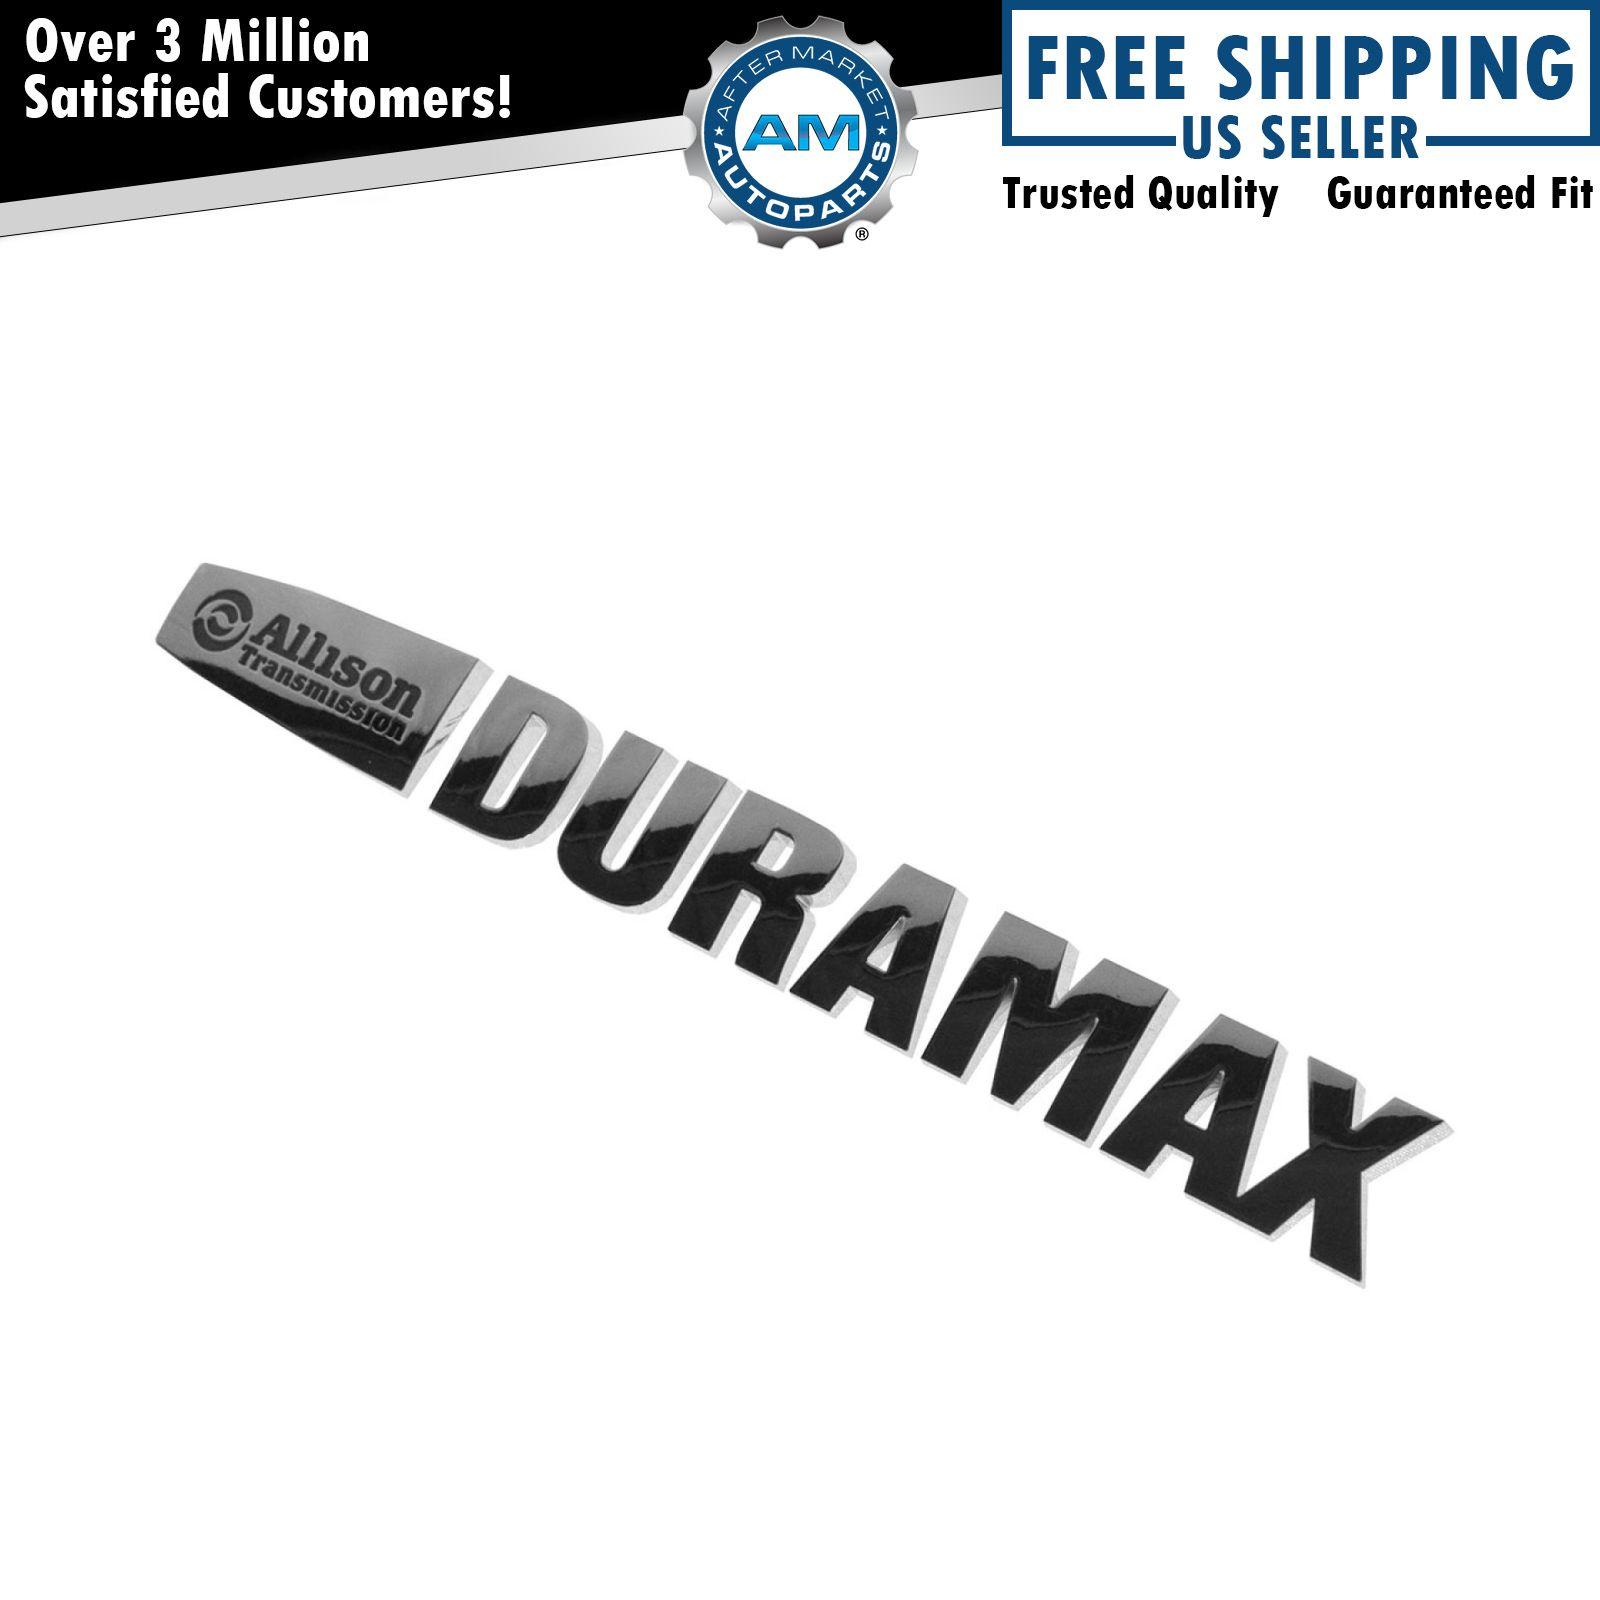 GM Allison Duramax Emblem Letter Set Chrome for 15 Chevy Silverado ...